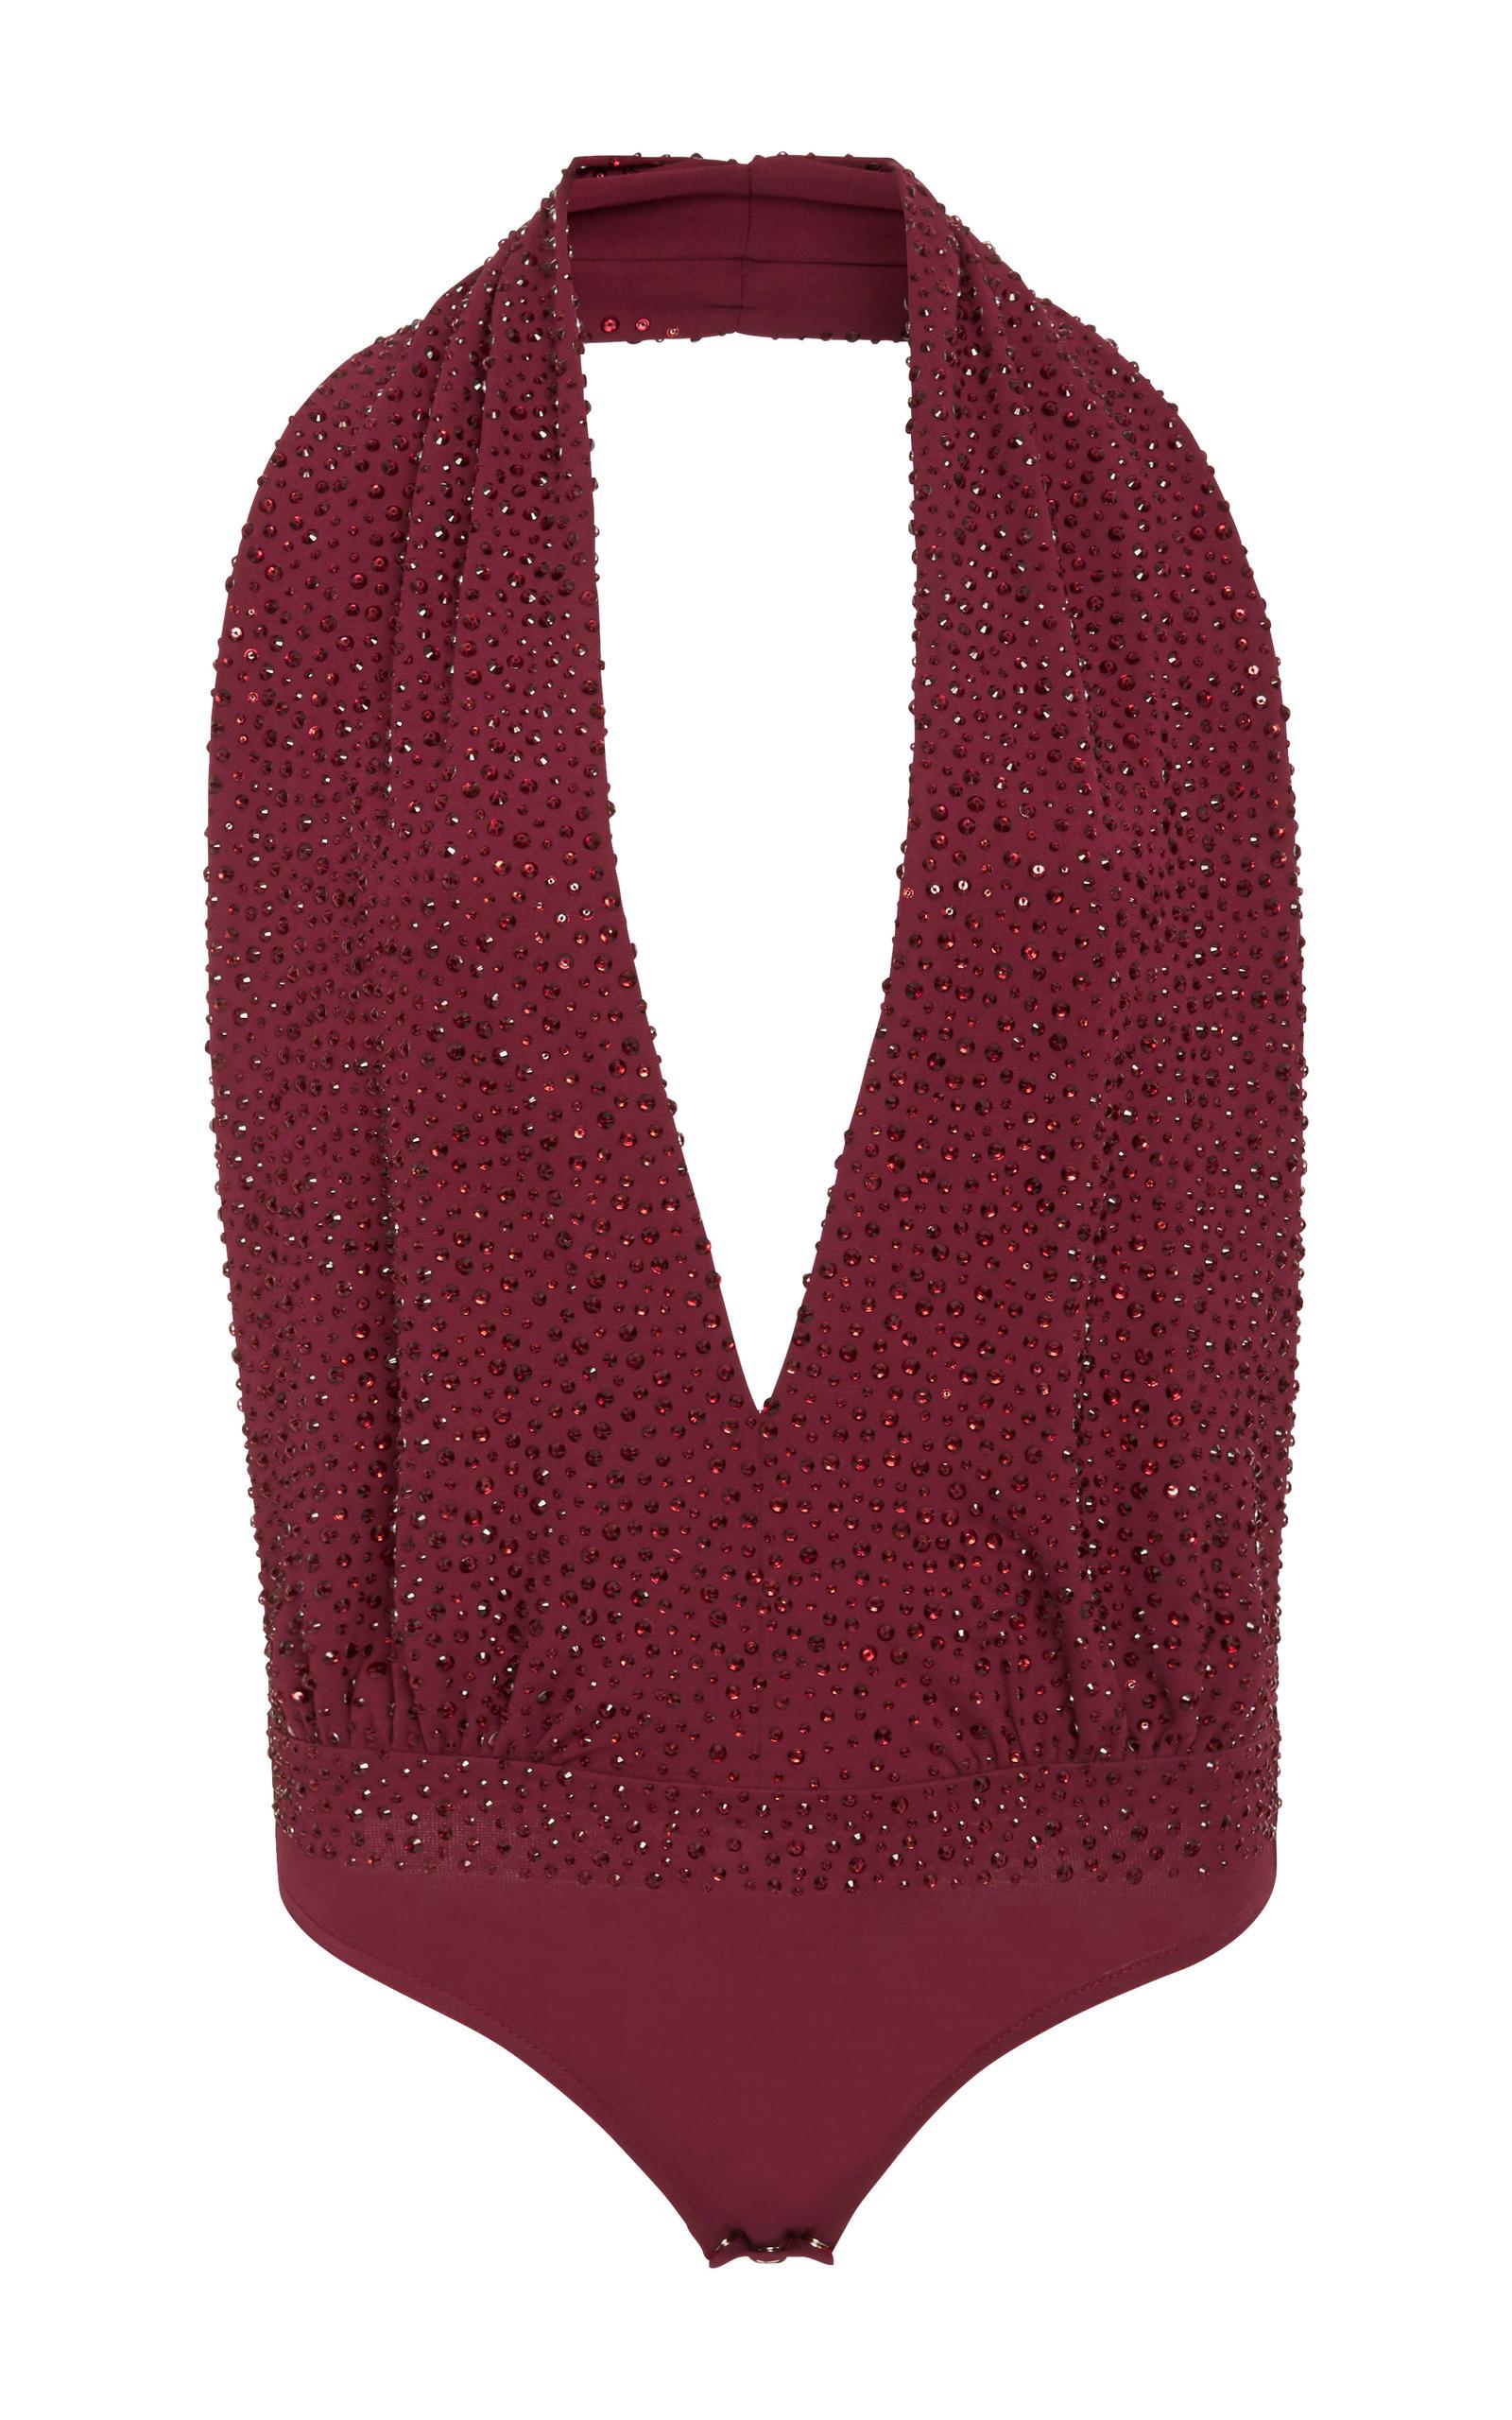 large_michael-kors-red-crystal-halter-bodysuit.jpg